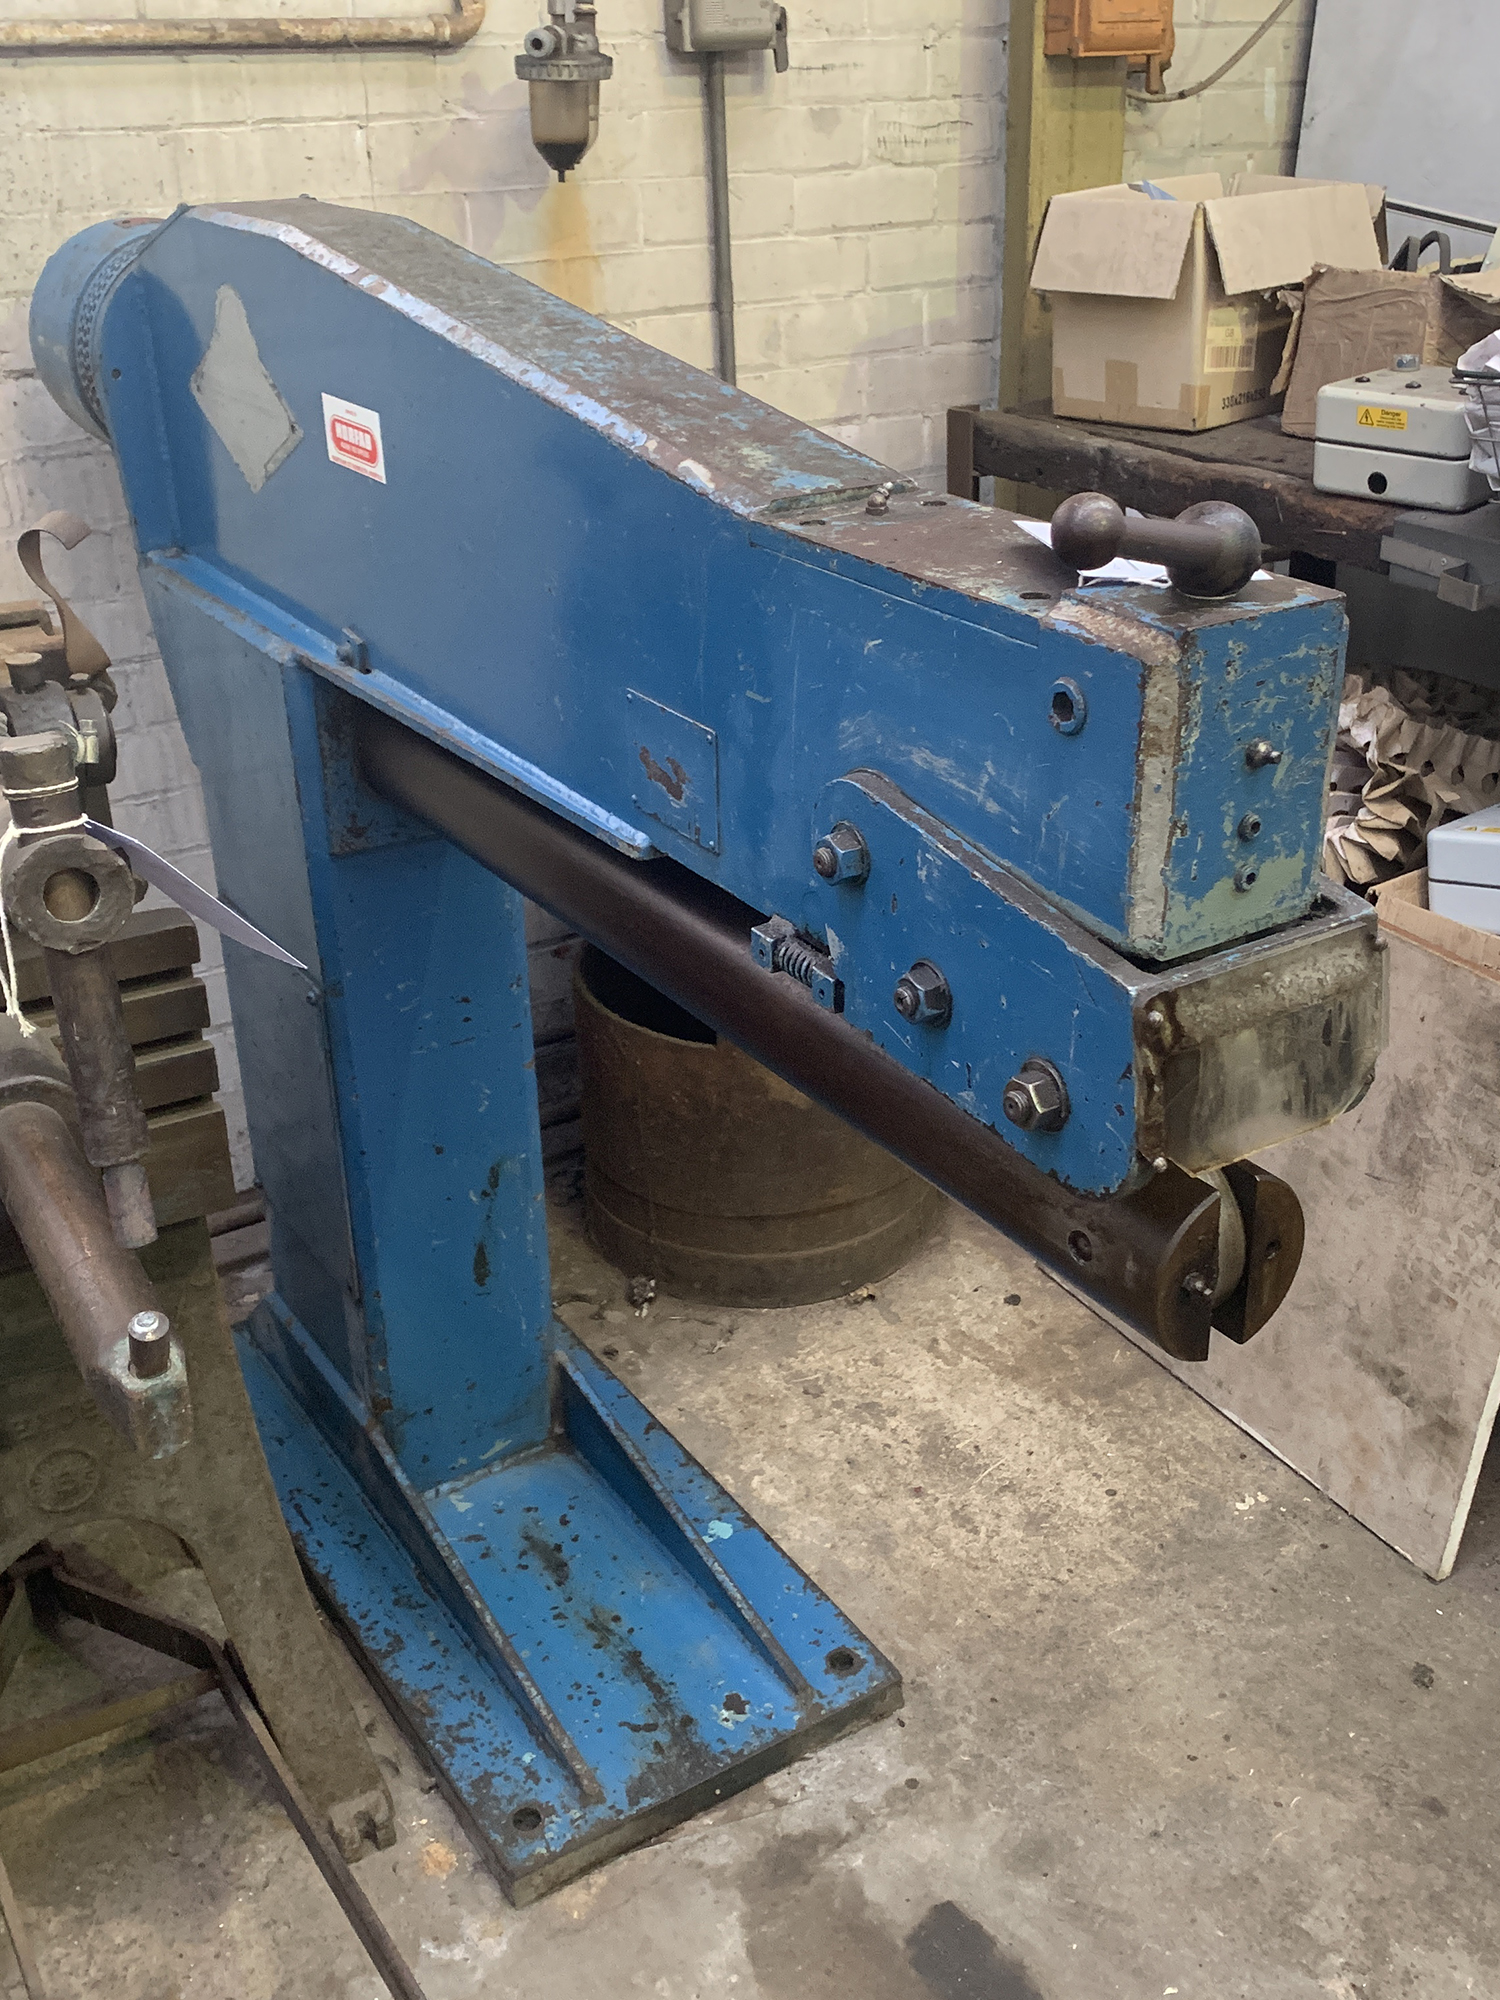 FJ Edwards Seam Closing Machine. Capacity 36''. - Image 3 of 5